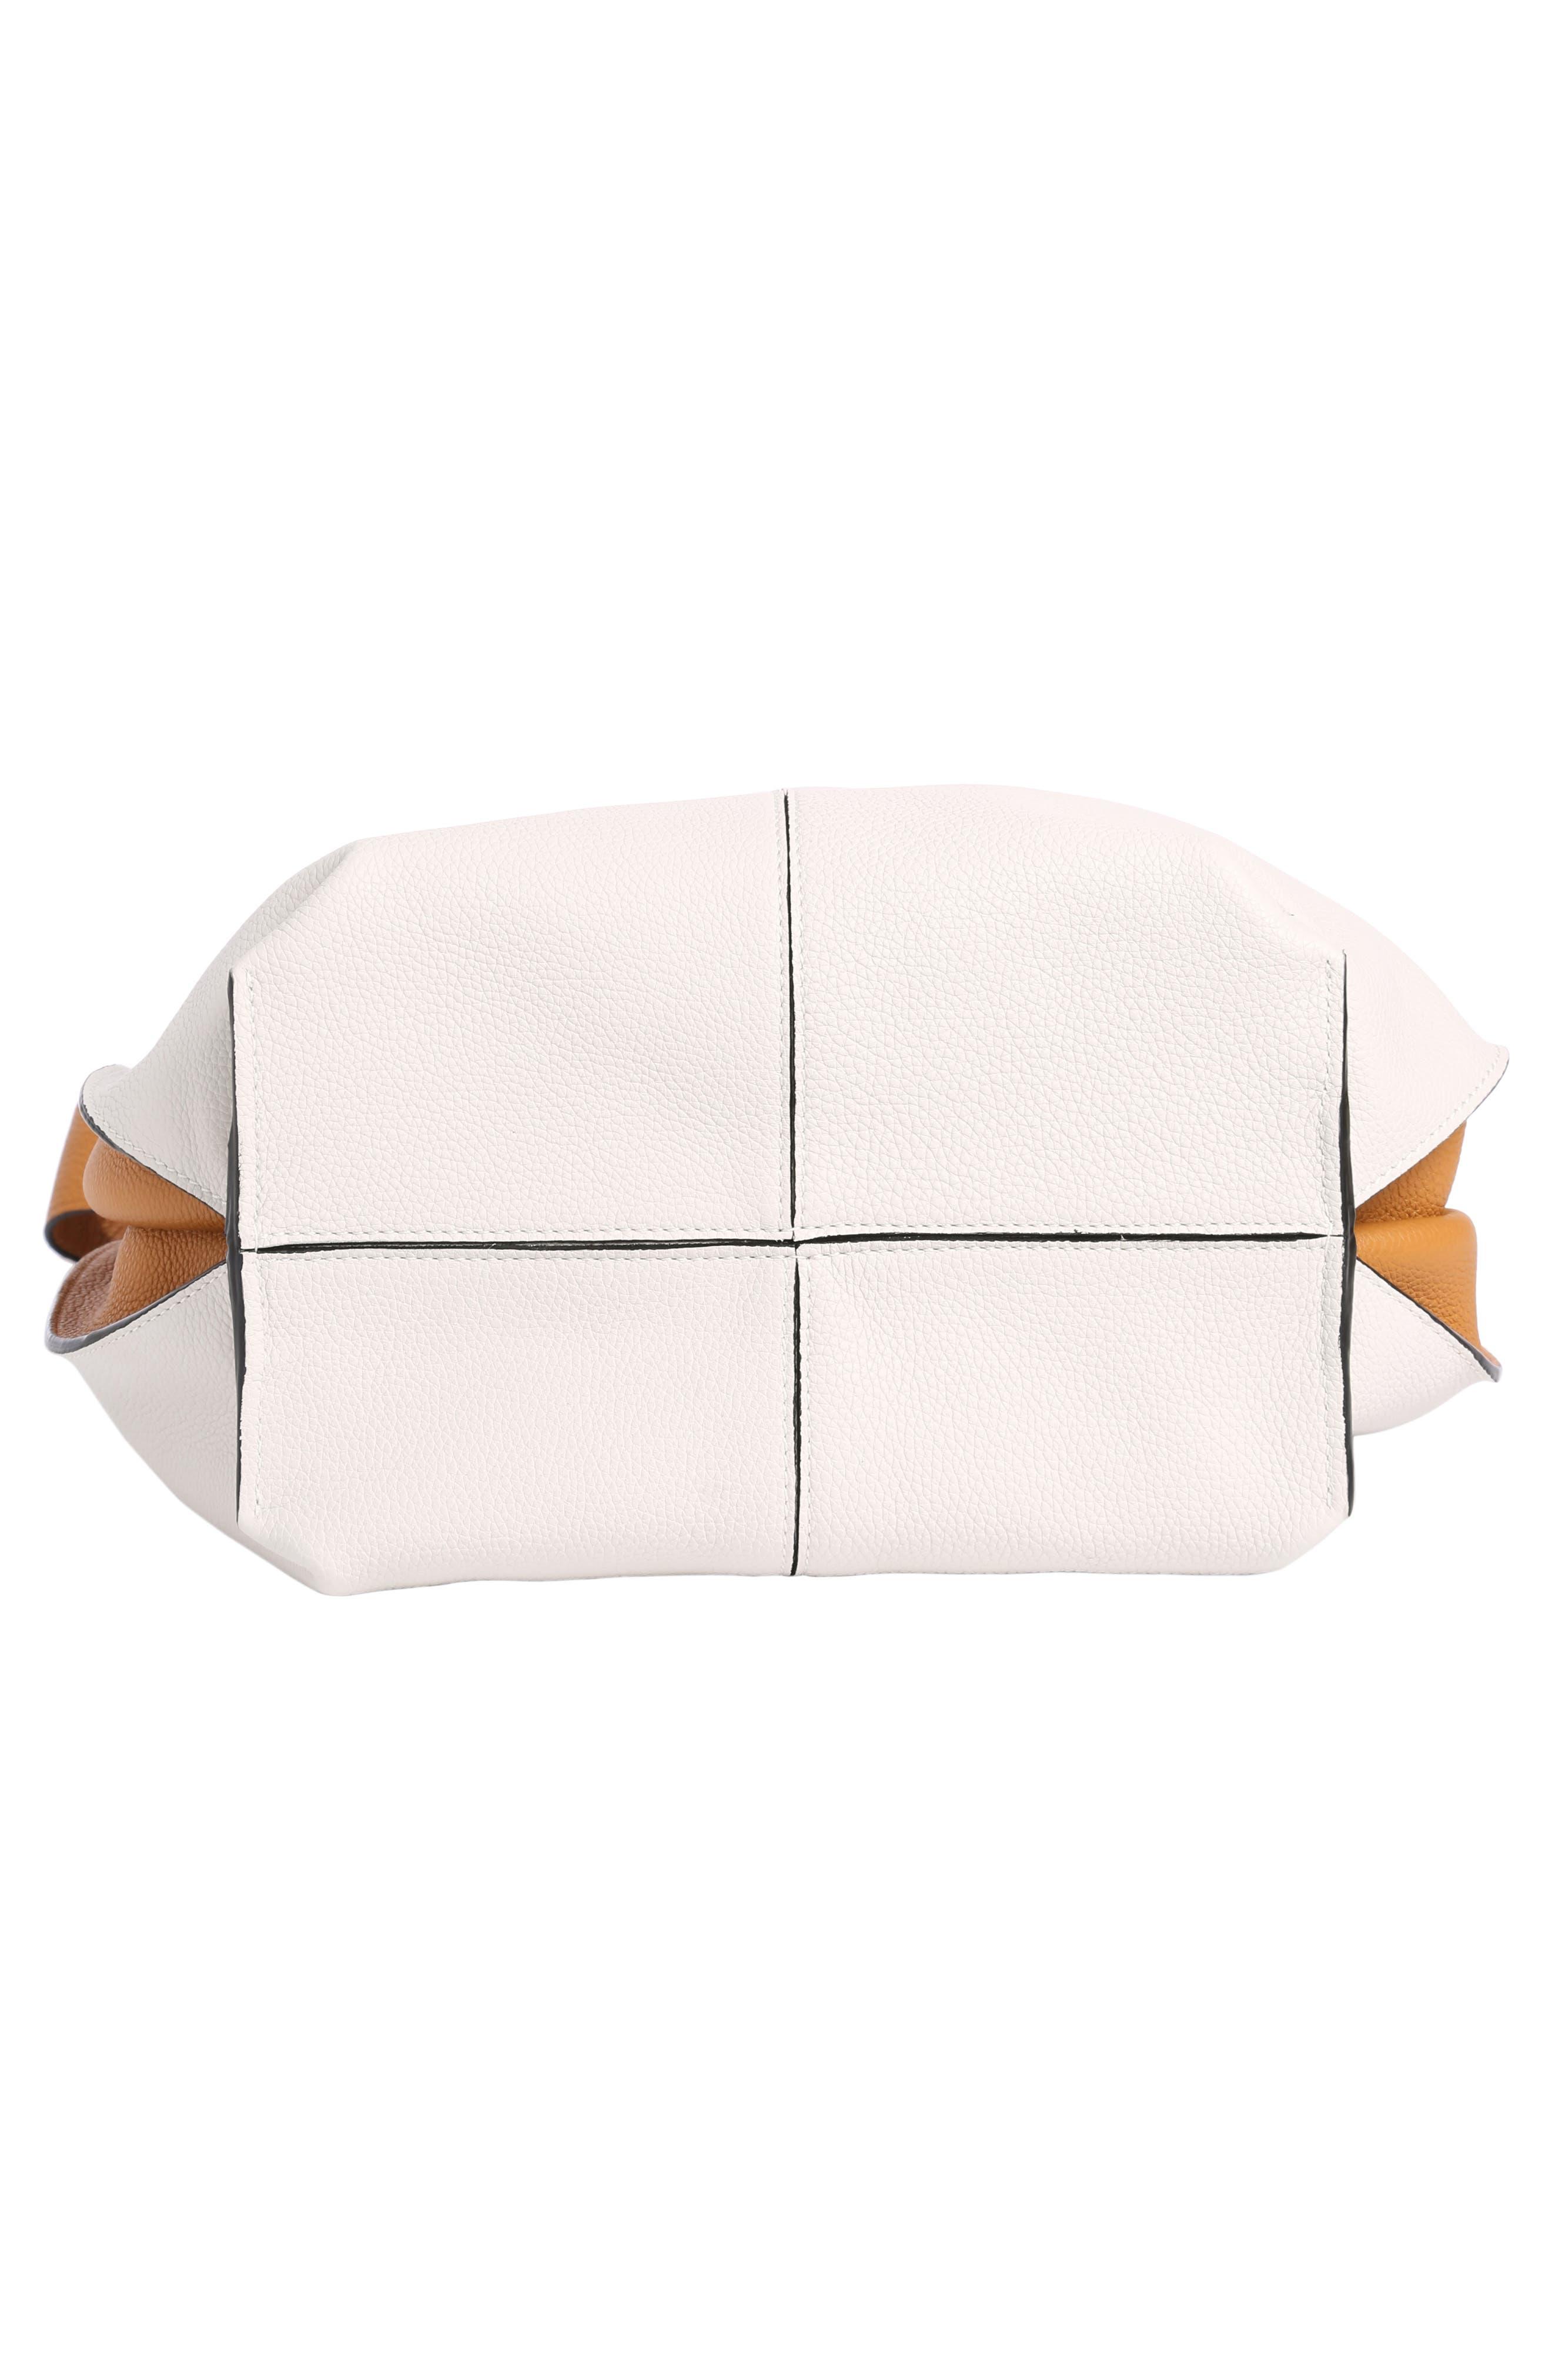 Leather Hobo Tote Bag,                             Alternate thumbnail 4, color,                             Soft White/ Amber